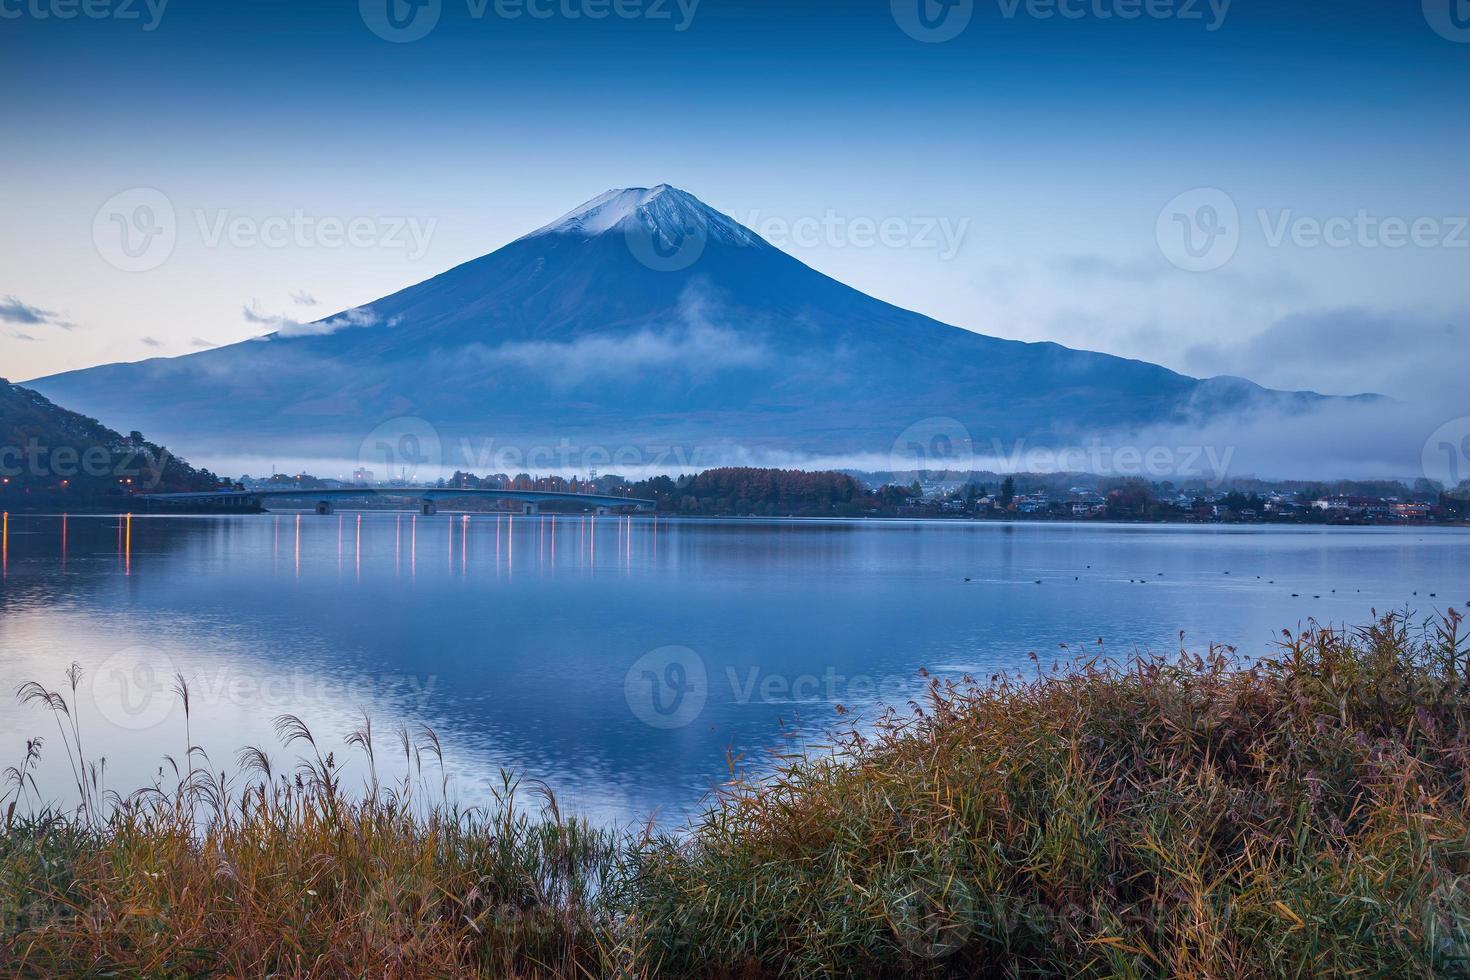 de prachtige berg Fuji in Japan bij zonsopgang foto